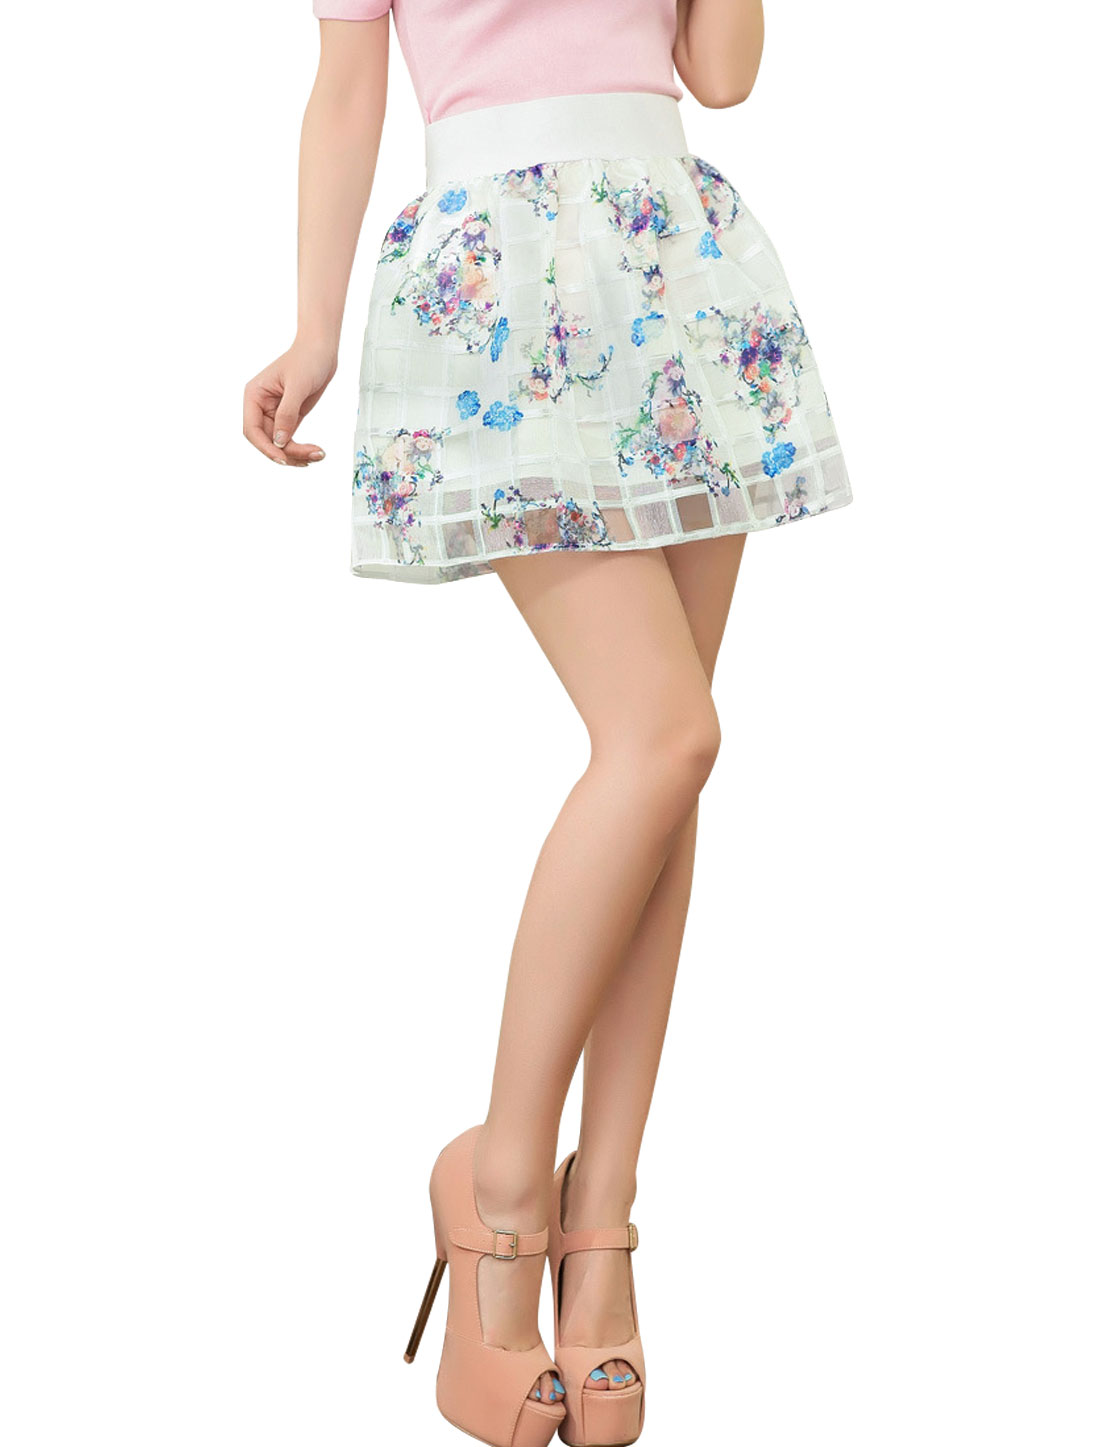 Woman Floral Plaids Design Elastic Waist Band Skirt White Blue /S (US 4)